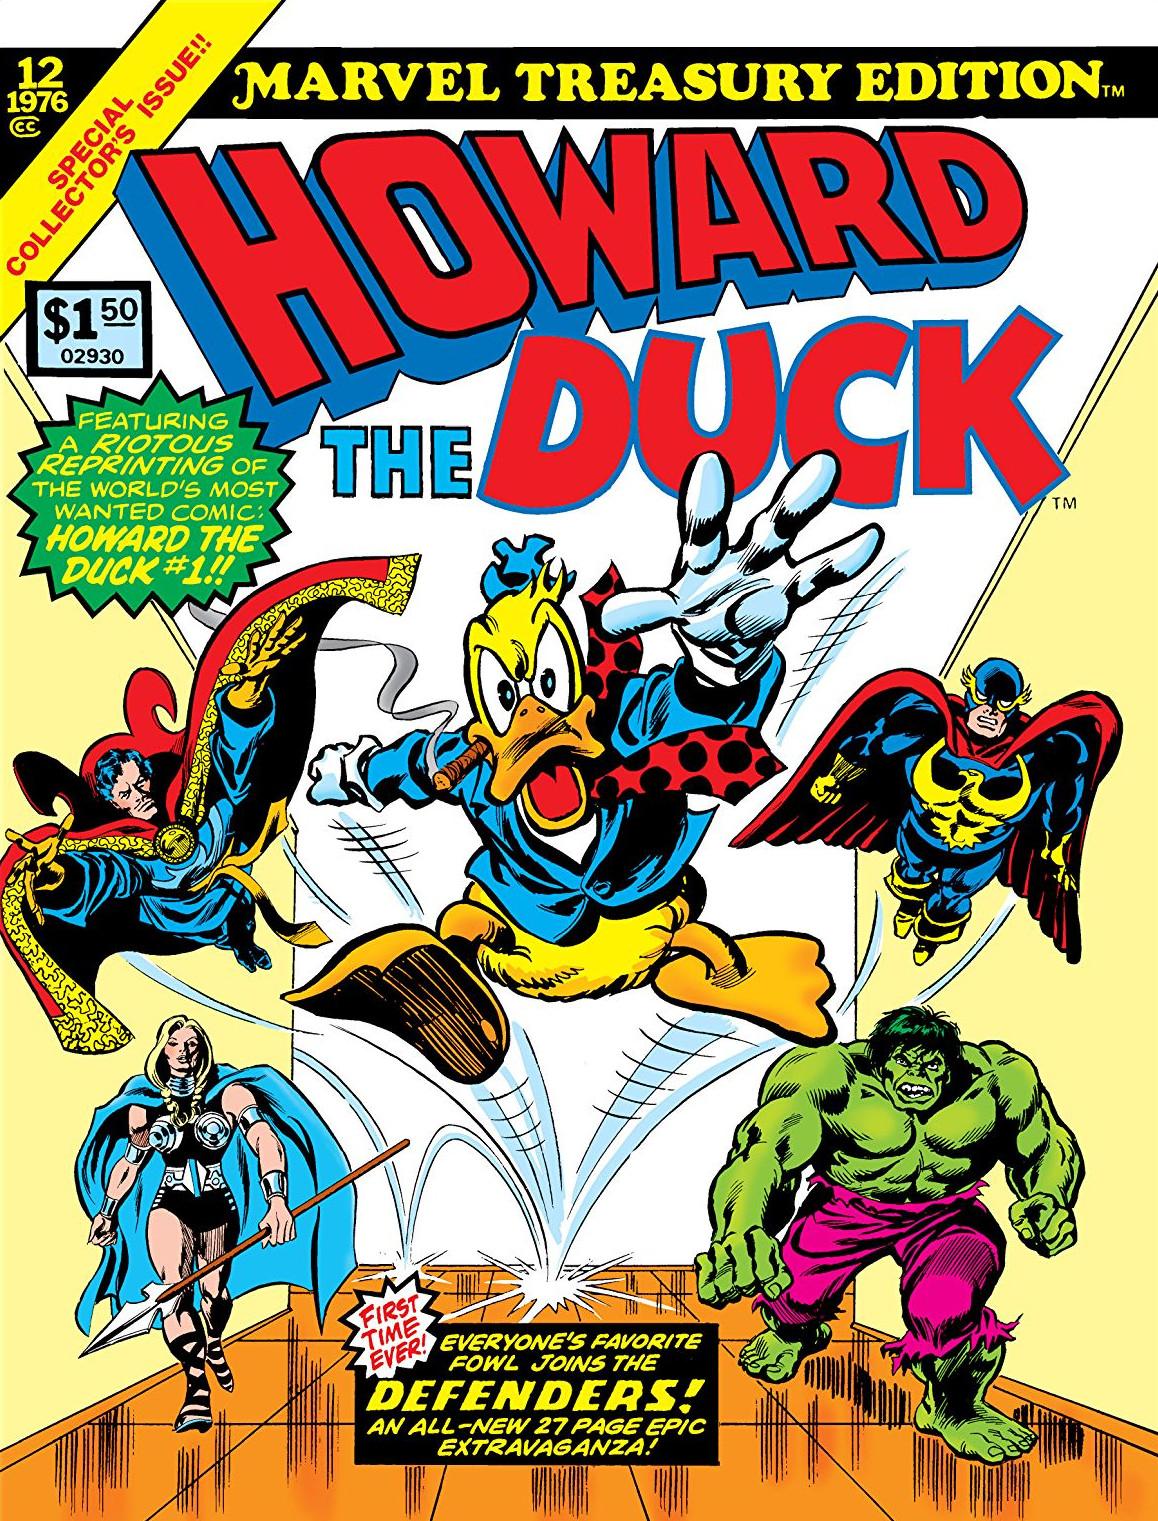 Marvel treasury edition (1974) comic books.